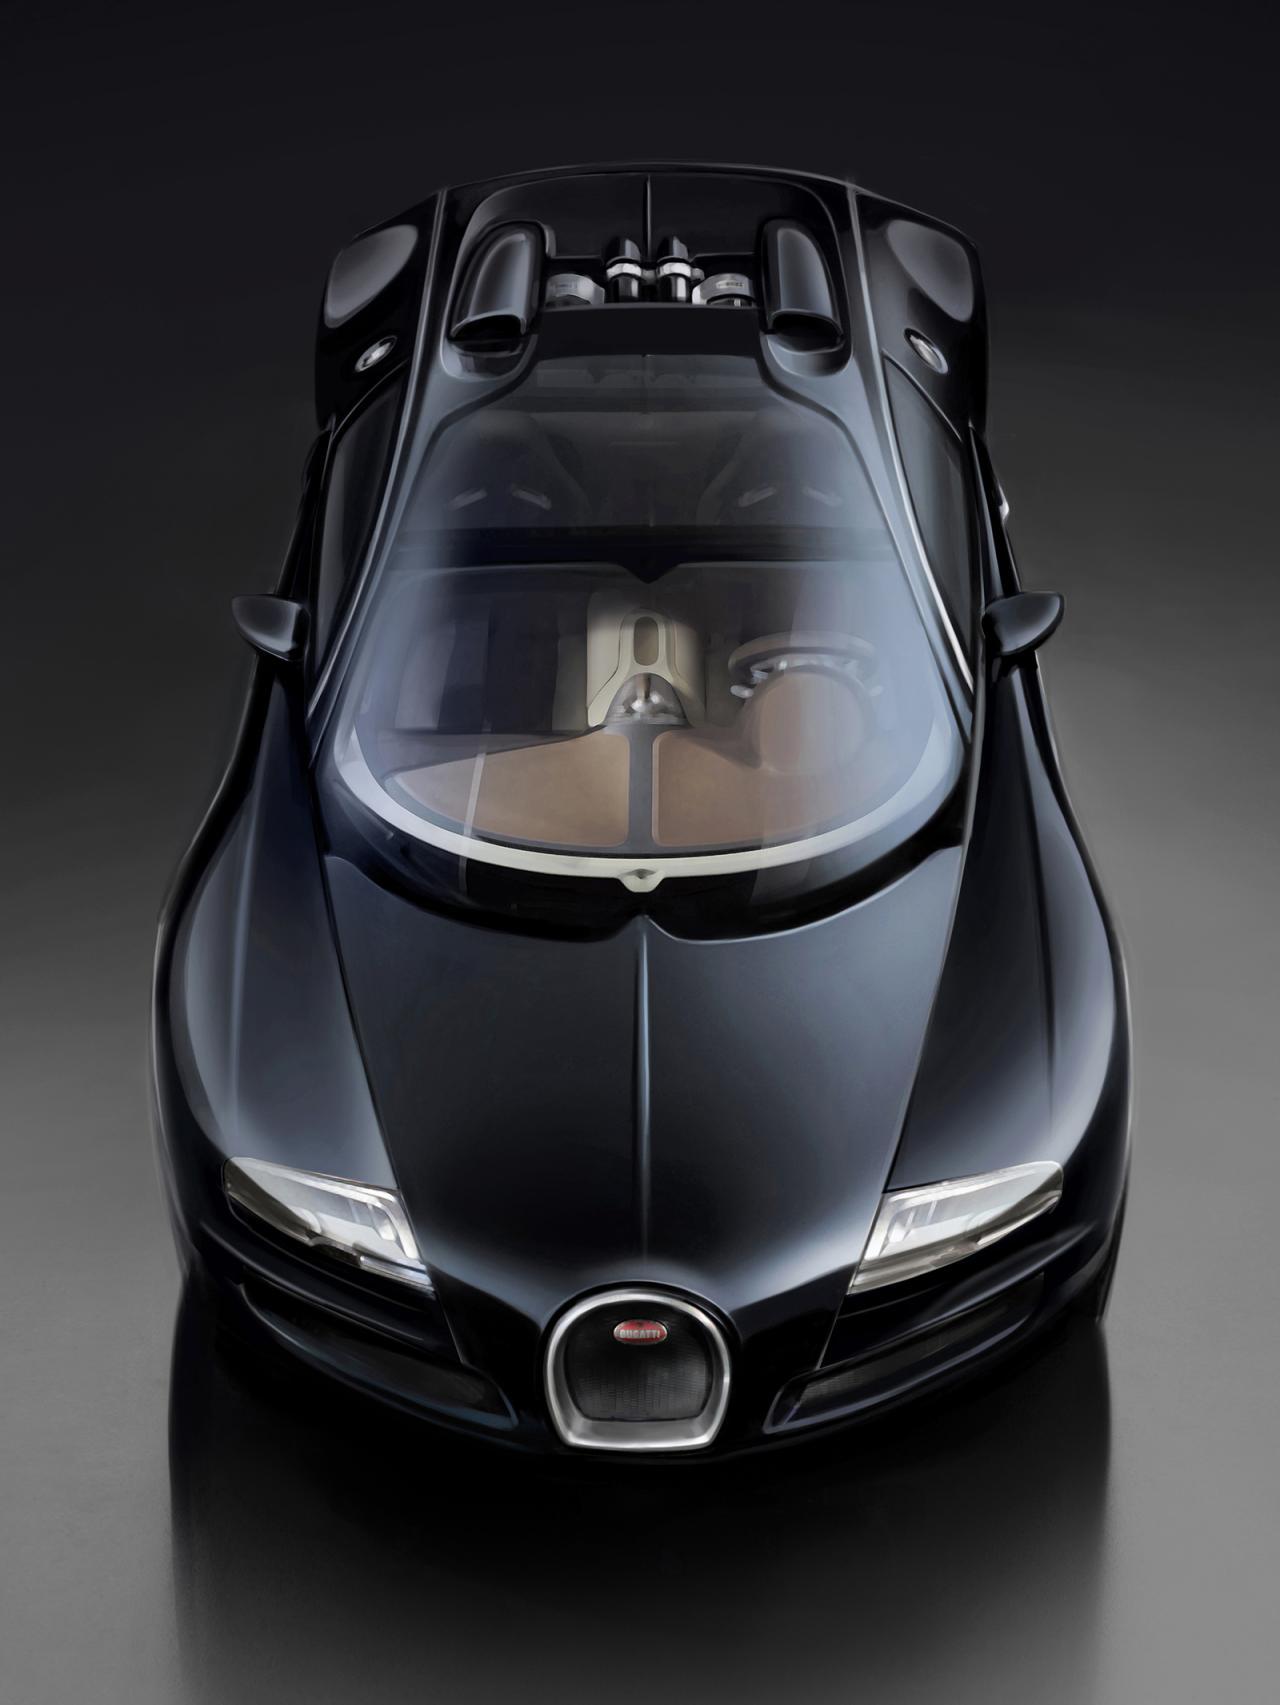 Bugatti-Veyron-Grand-Sport-Vitesse-Jean-Bugatti-7